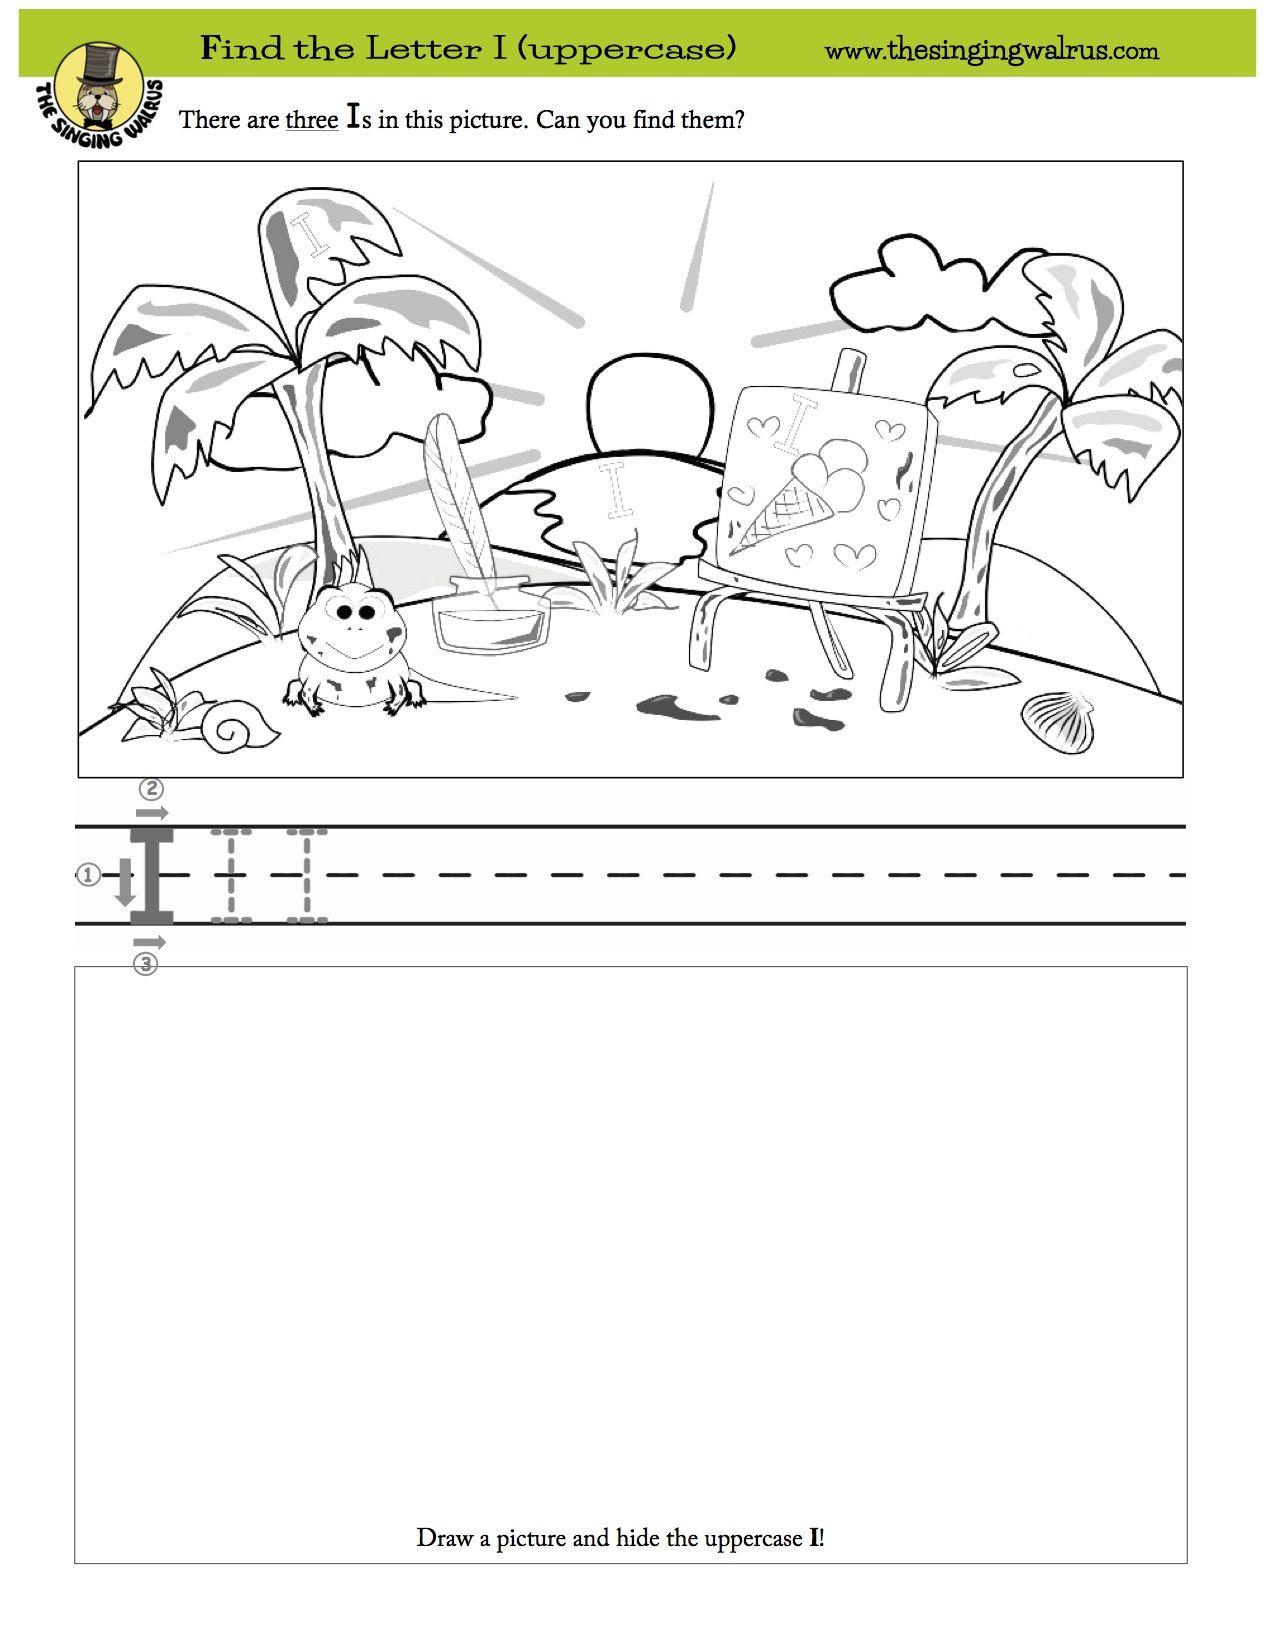 An Iguana On An Island Doing An Illustration Of Ice Cream